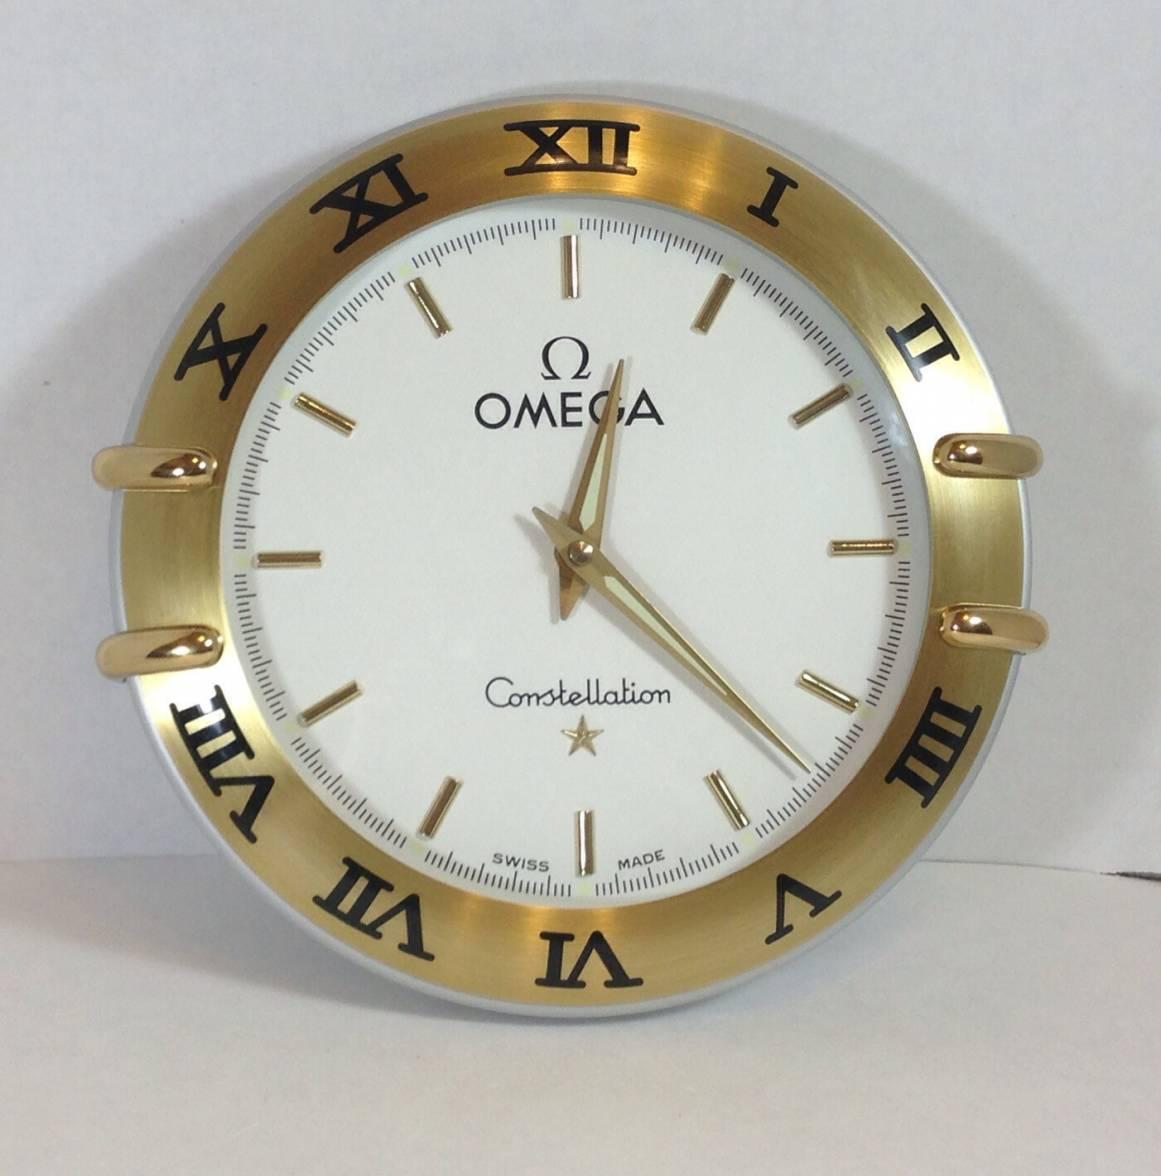 Omega constellation wall clock help omega forums for Omega speedmaster wall clock